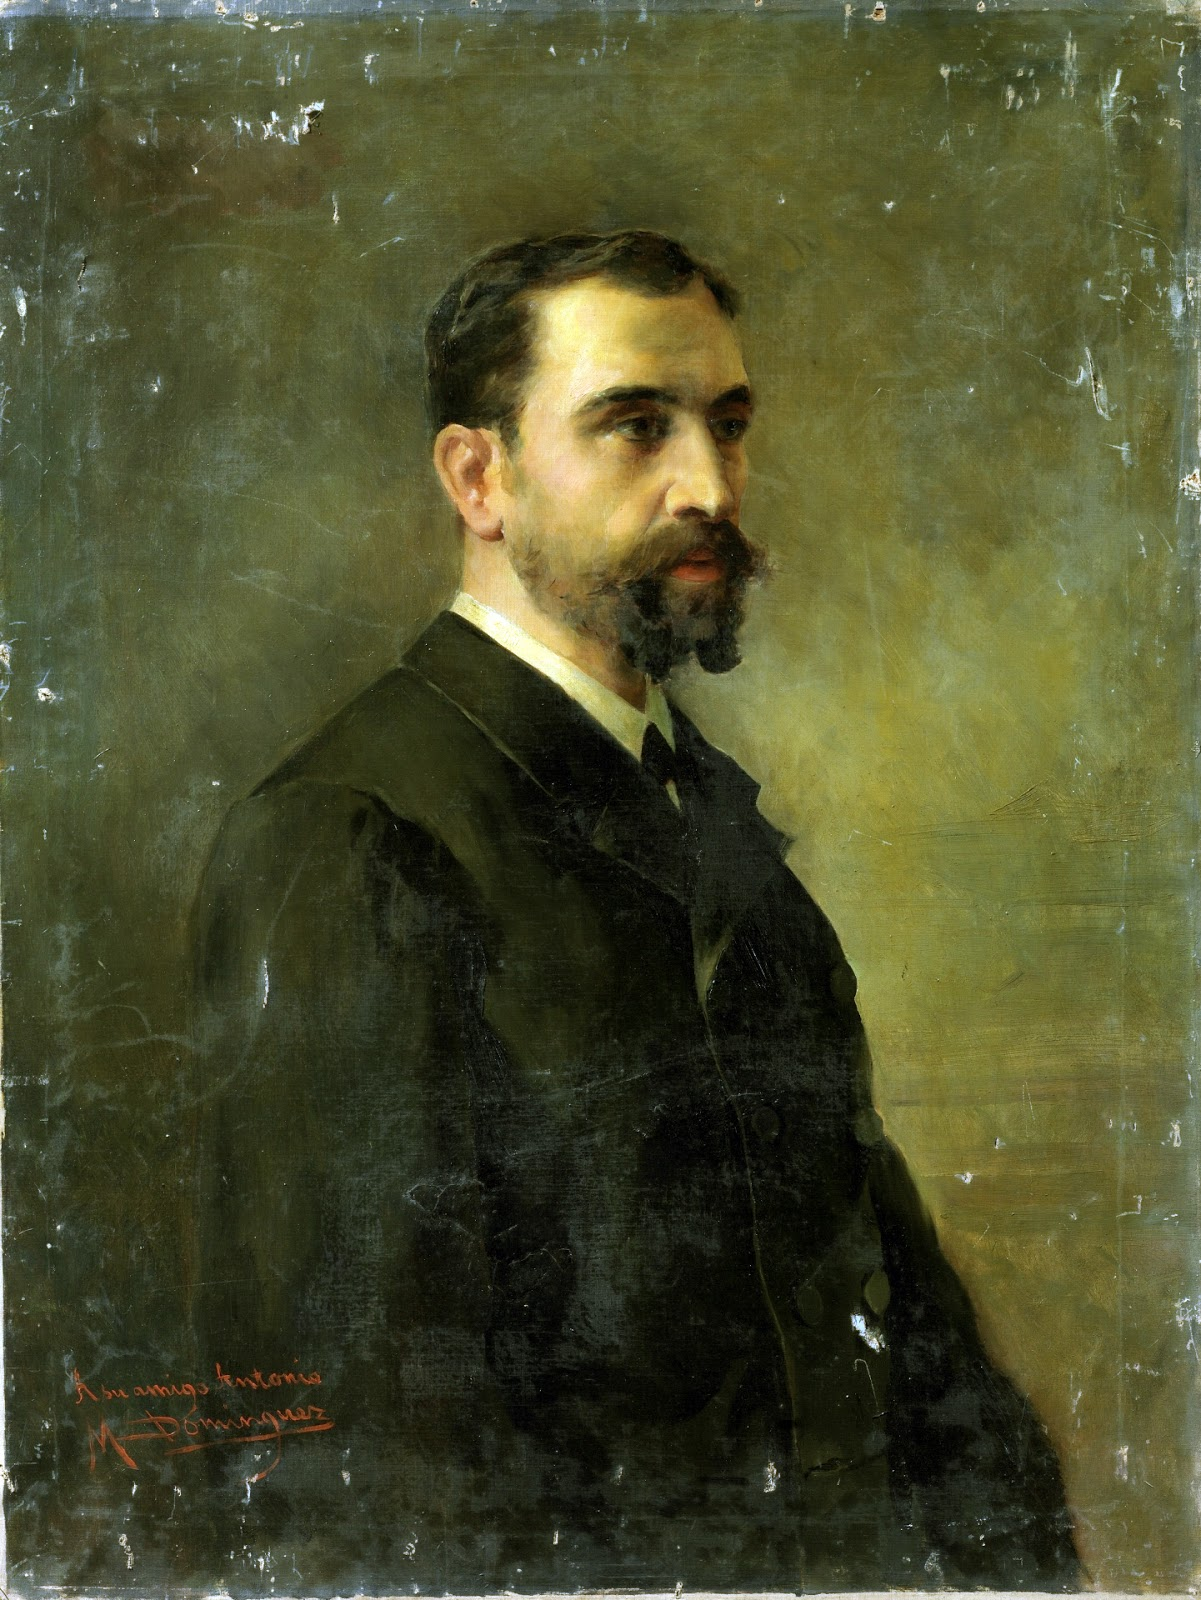 Maestros espa oles del retrato manuel dom nguez y s nchez for Alfonso dominguez madrid